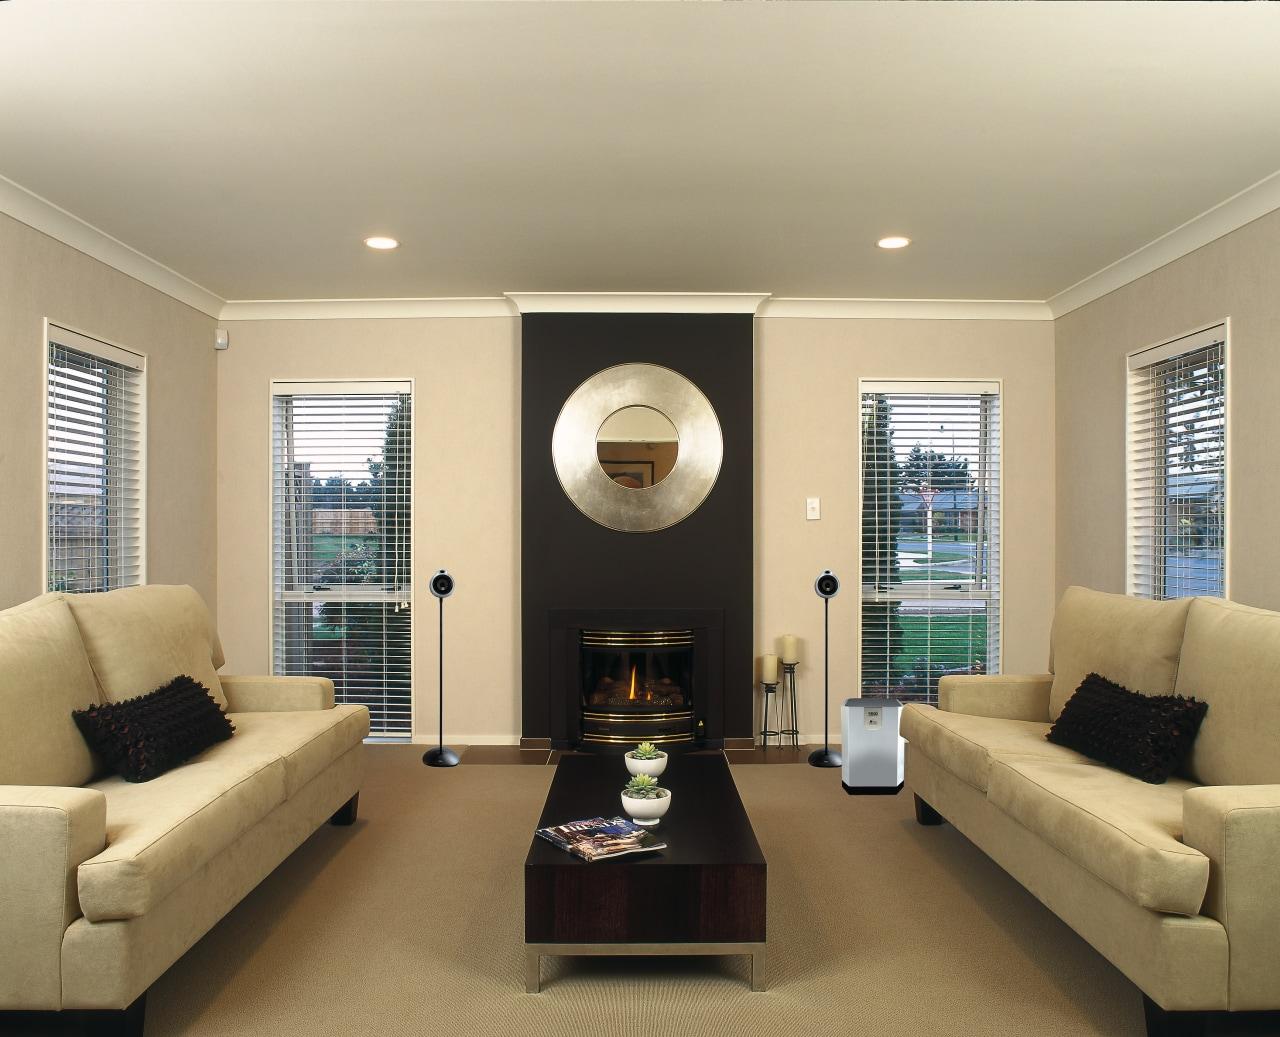 Interior view of living area ceiling, home, interior design, living room, real estate, room, window, orange